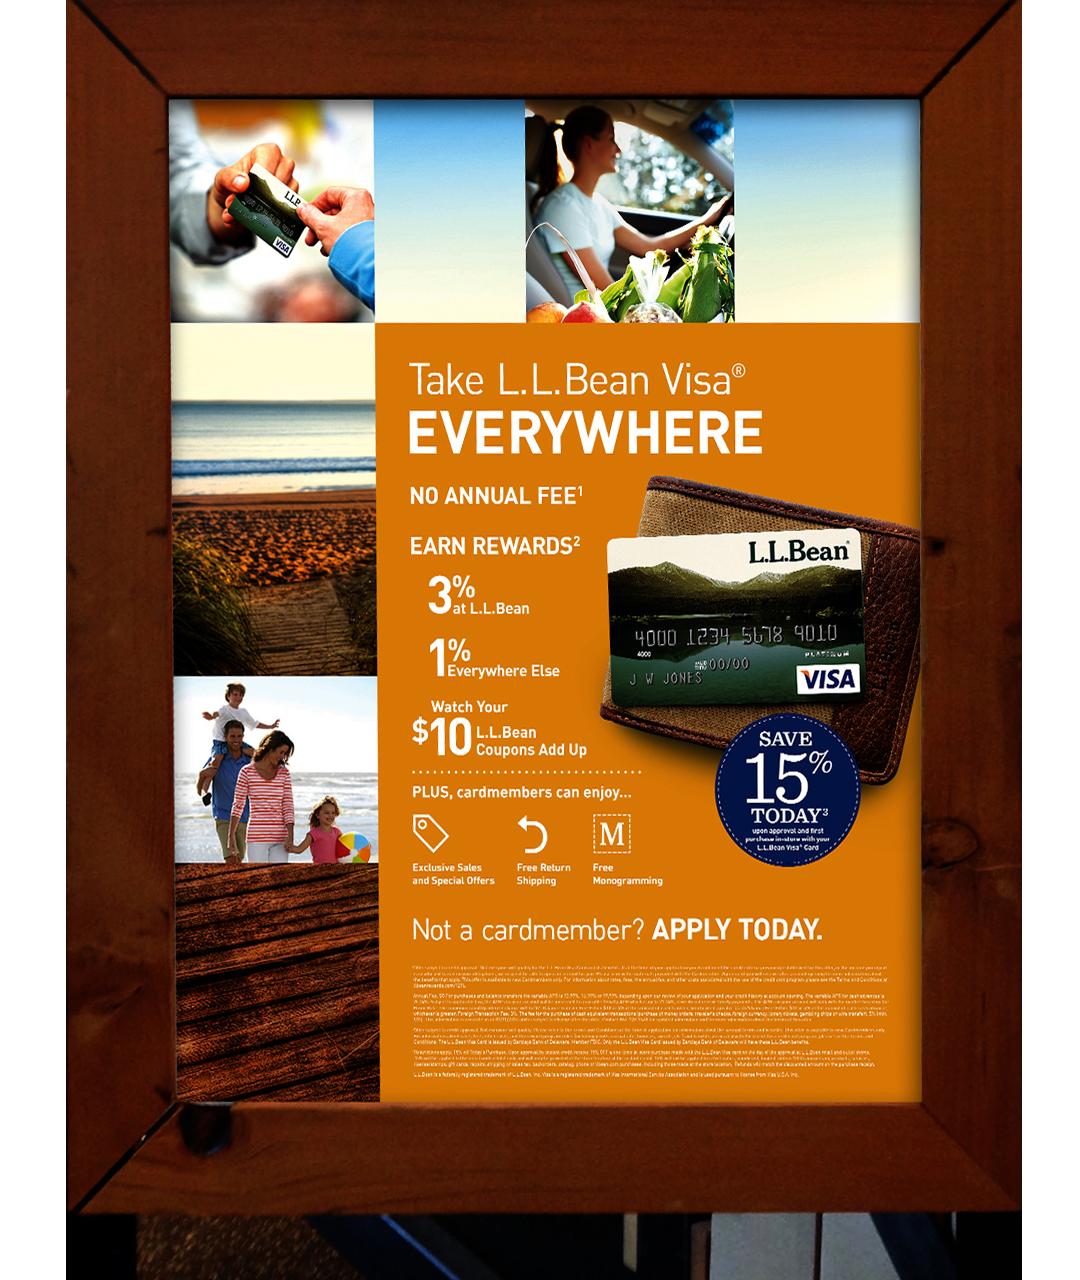 28230-LLBean Poster.png